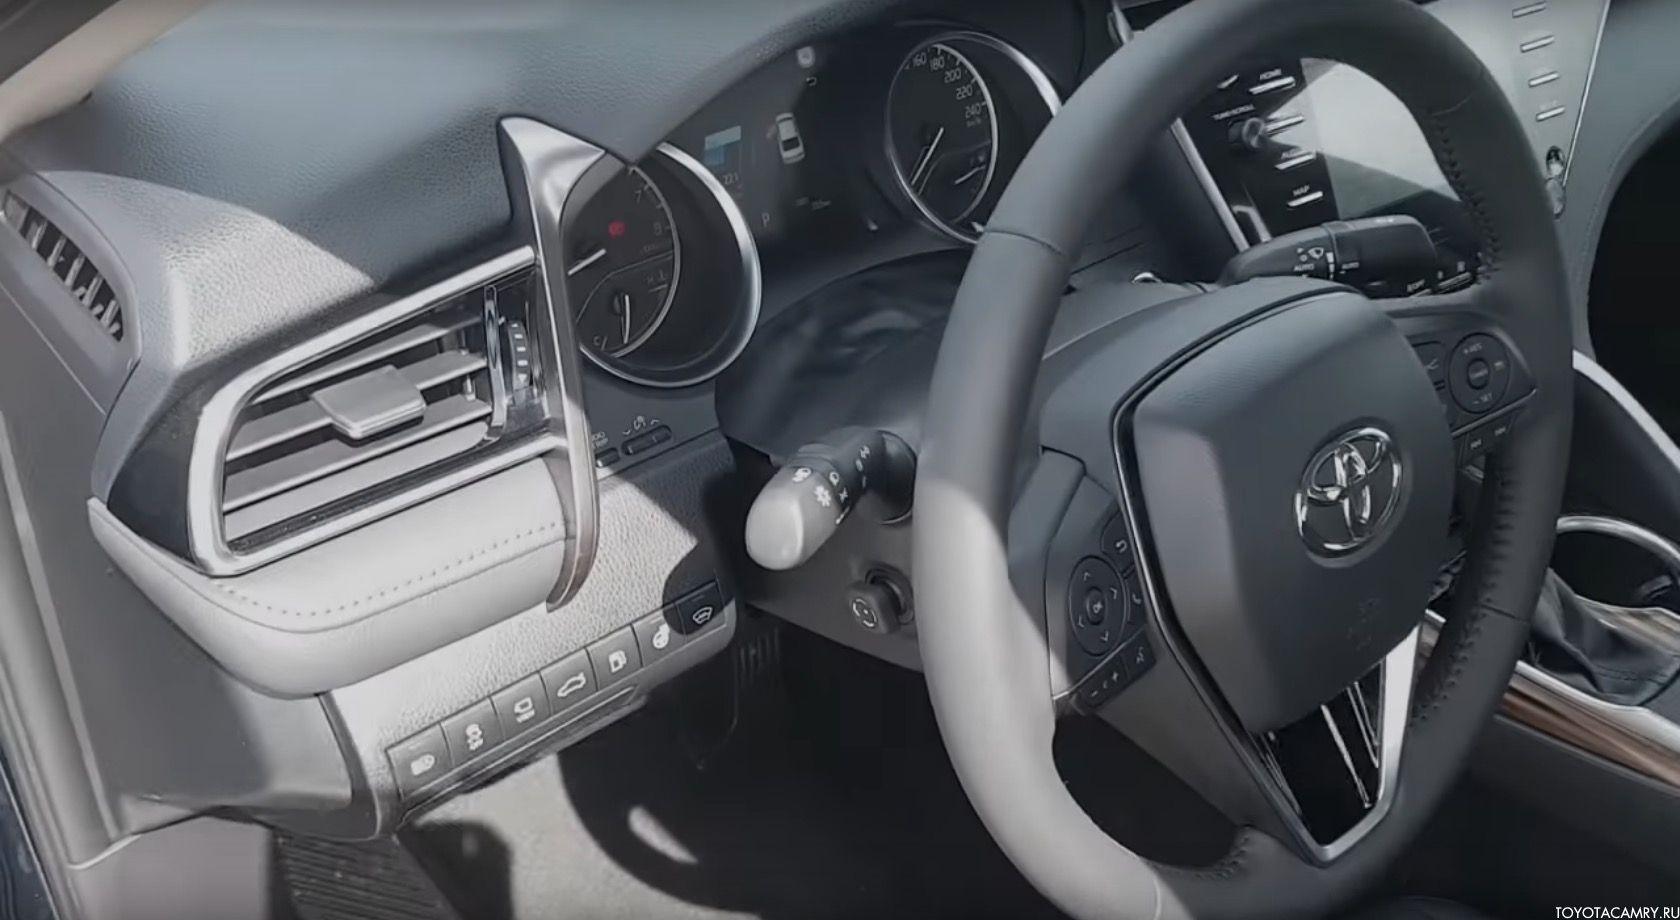 рулевое колесо Камри 2018-2019 Россия (V70)